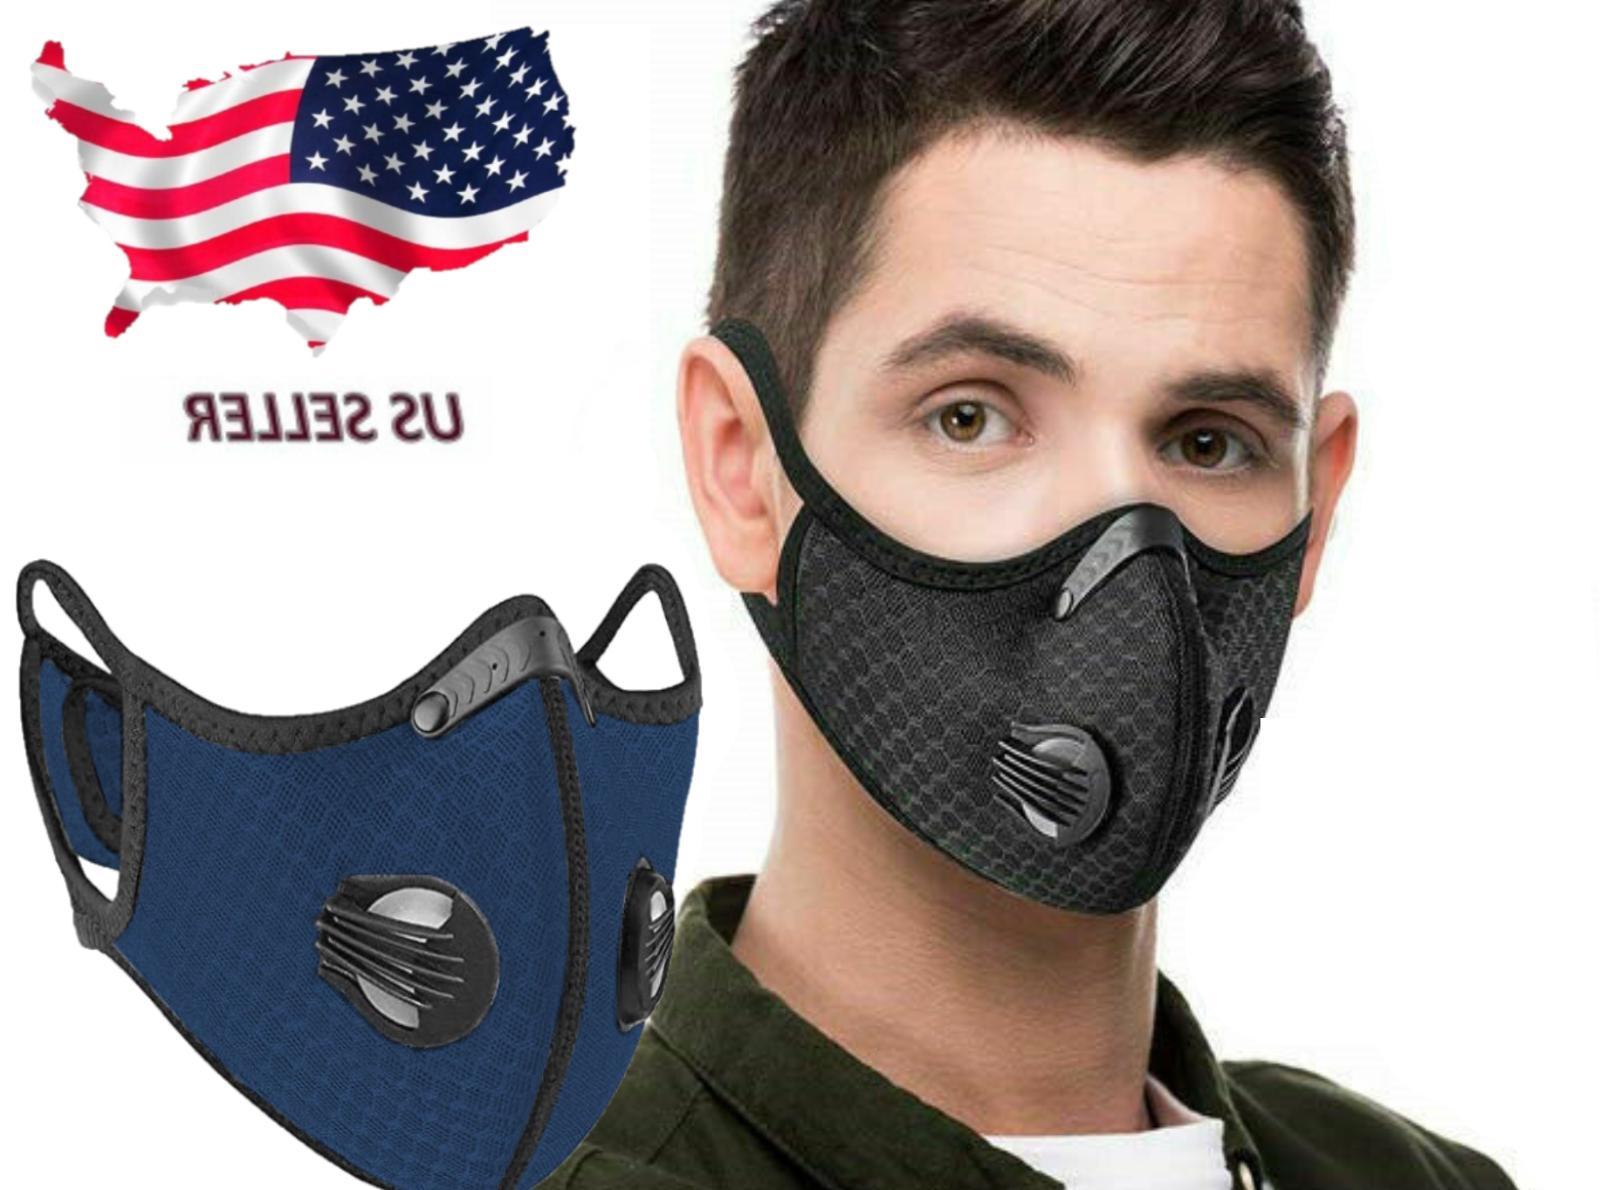 USA Air Breathe Vents